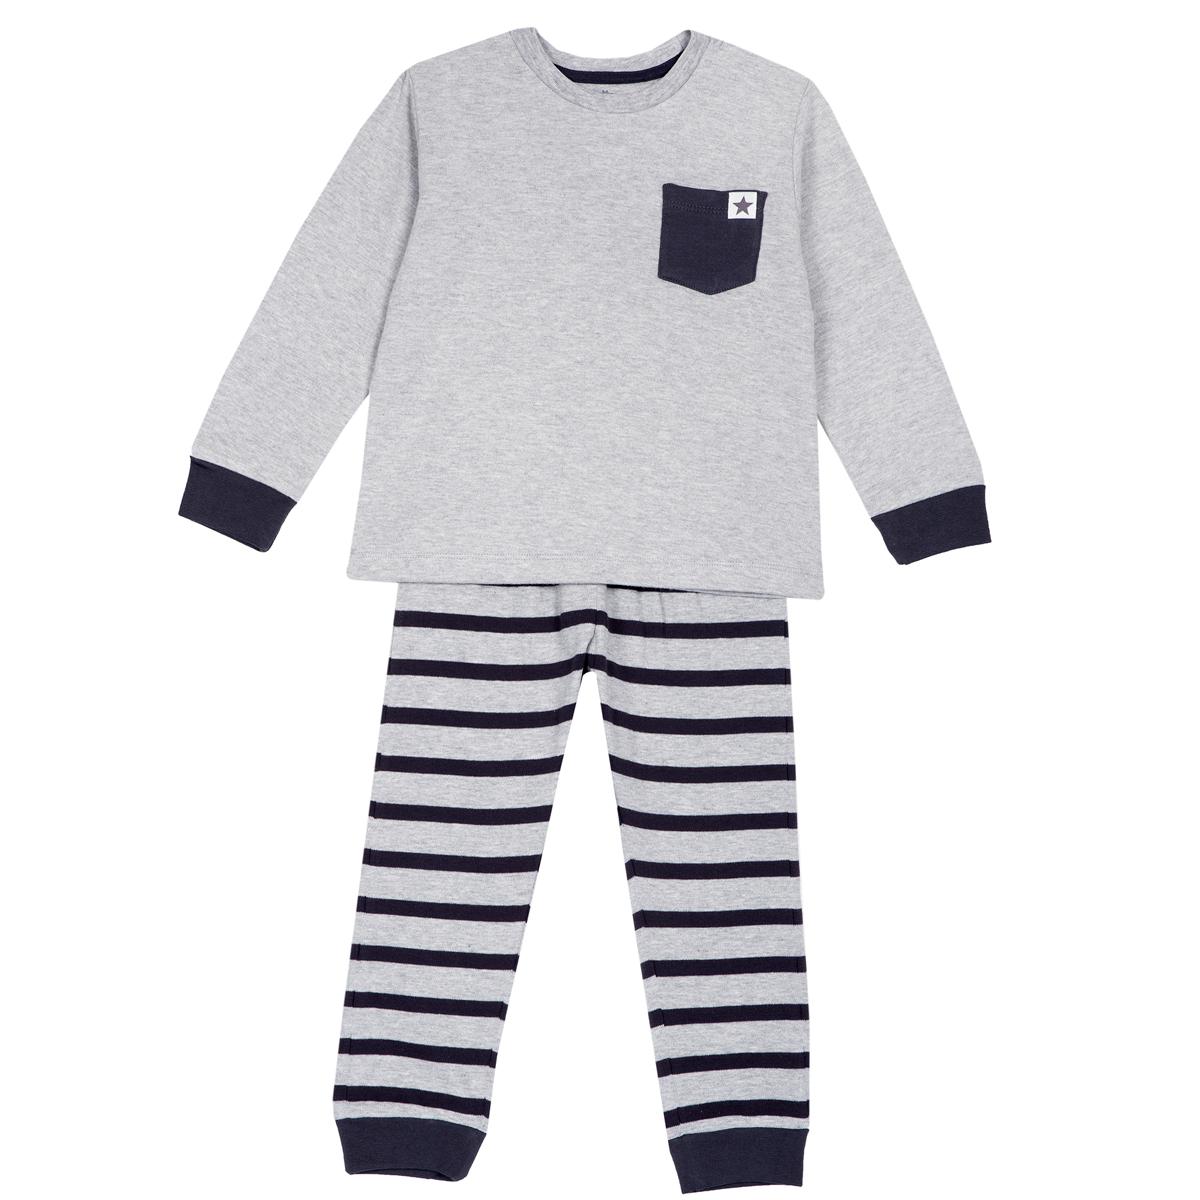 Pijama copii Chicco, maneca lunga, gri deschis, 31285